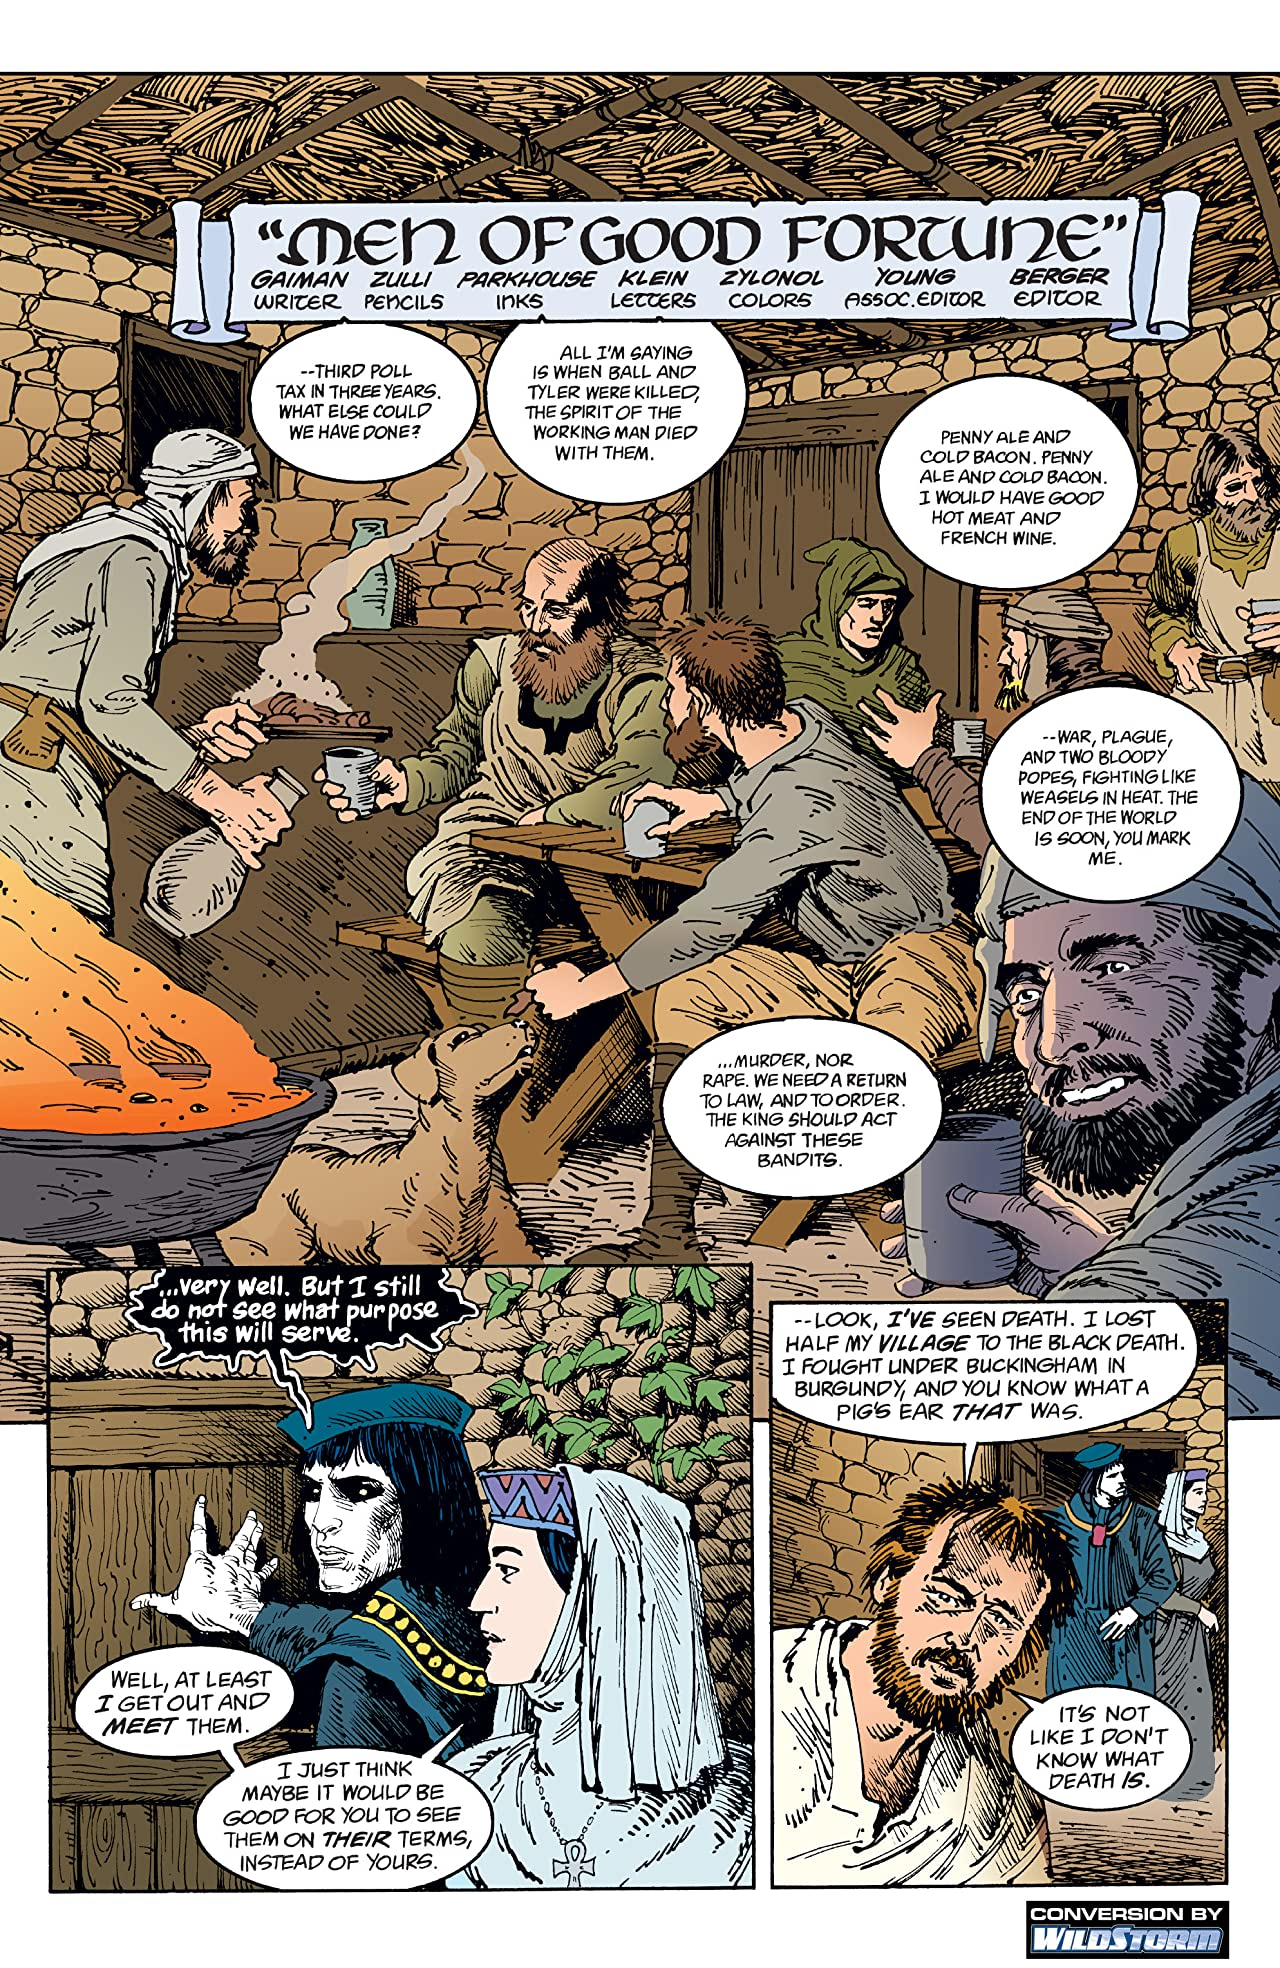 The Sandman #13